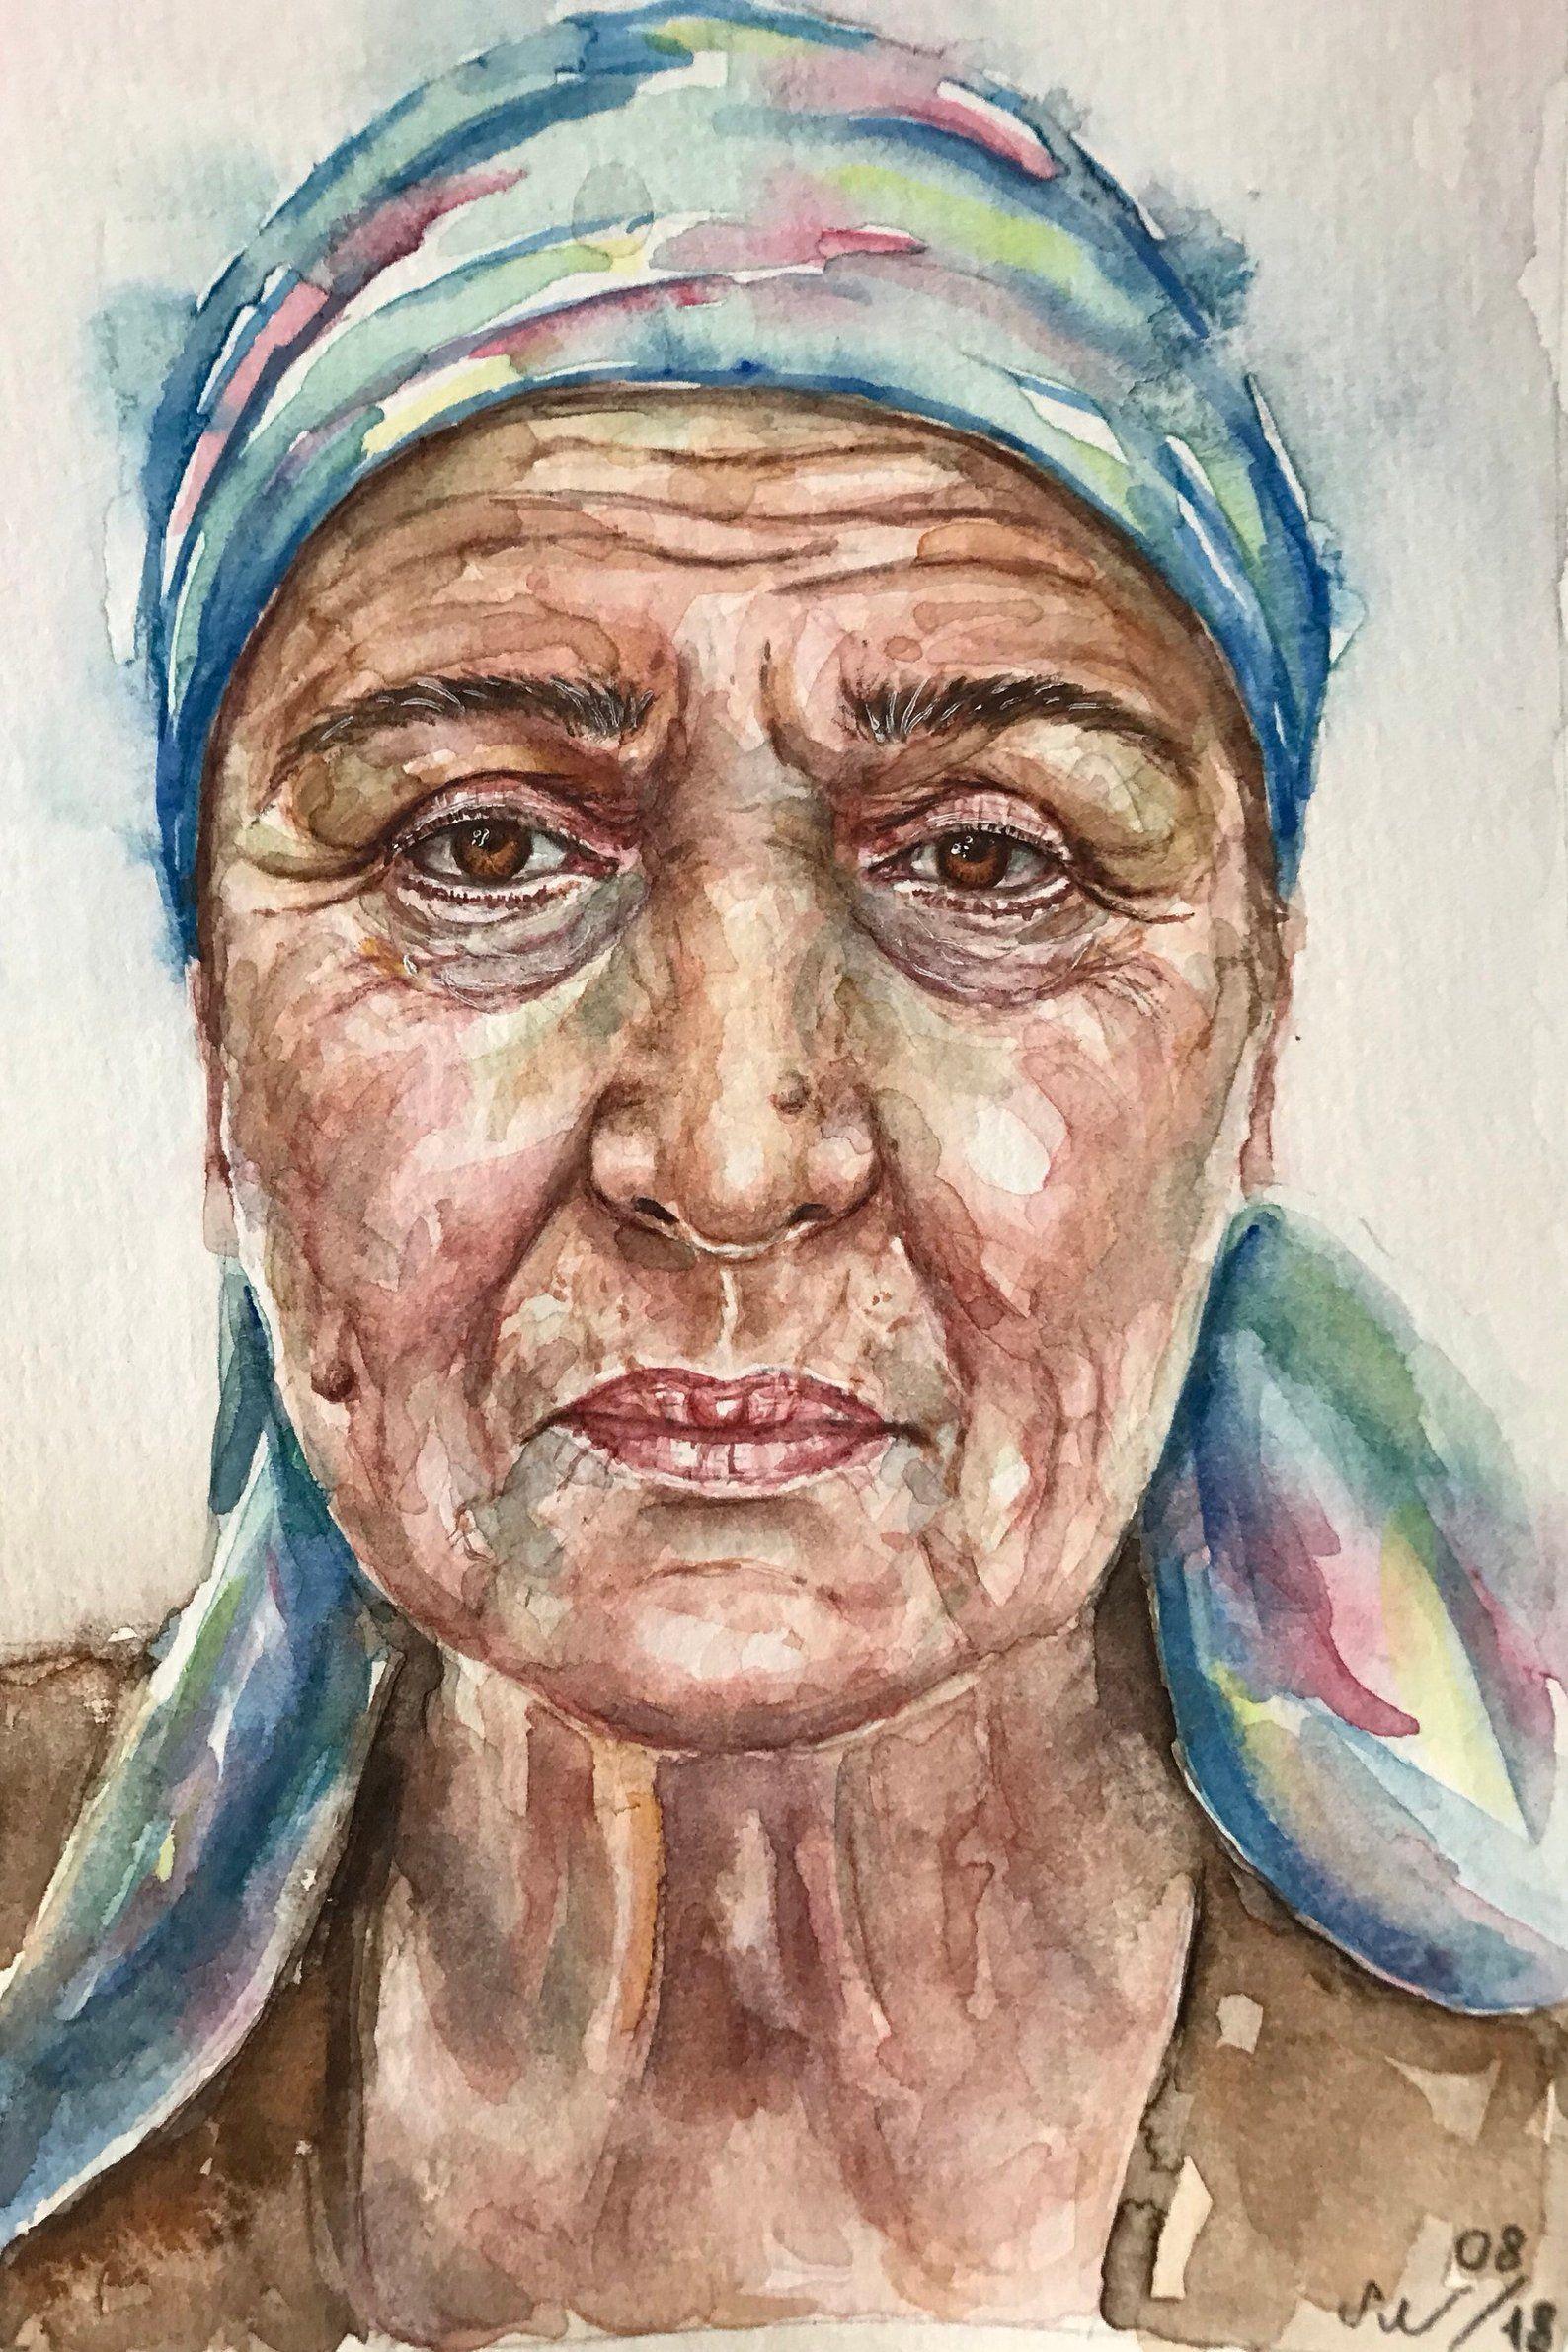 Old Woman Watercolor Portraitpeople Artwatercolor Etsy Watercolor Portrait Painting People Art Watercolor Portraits